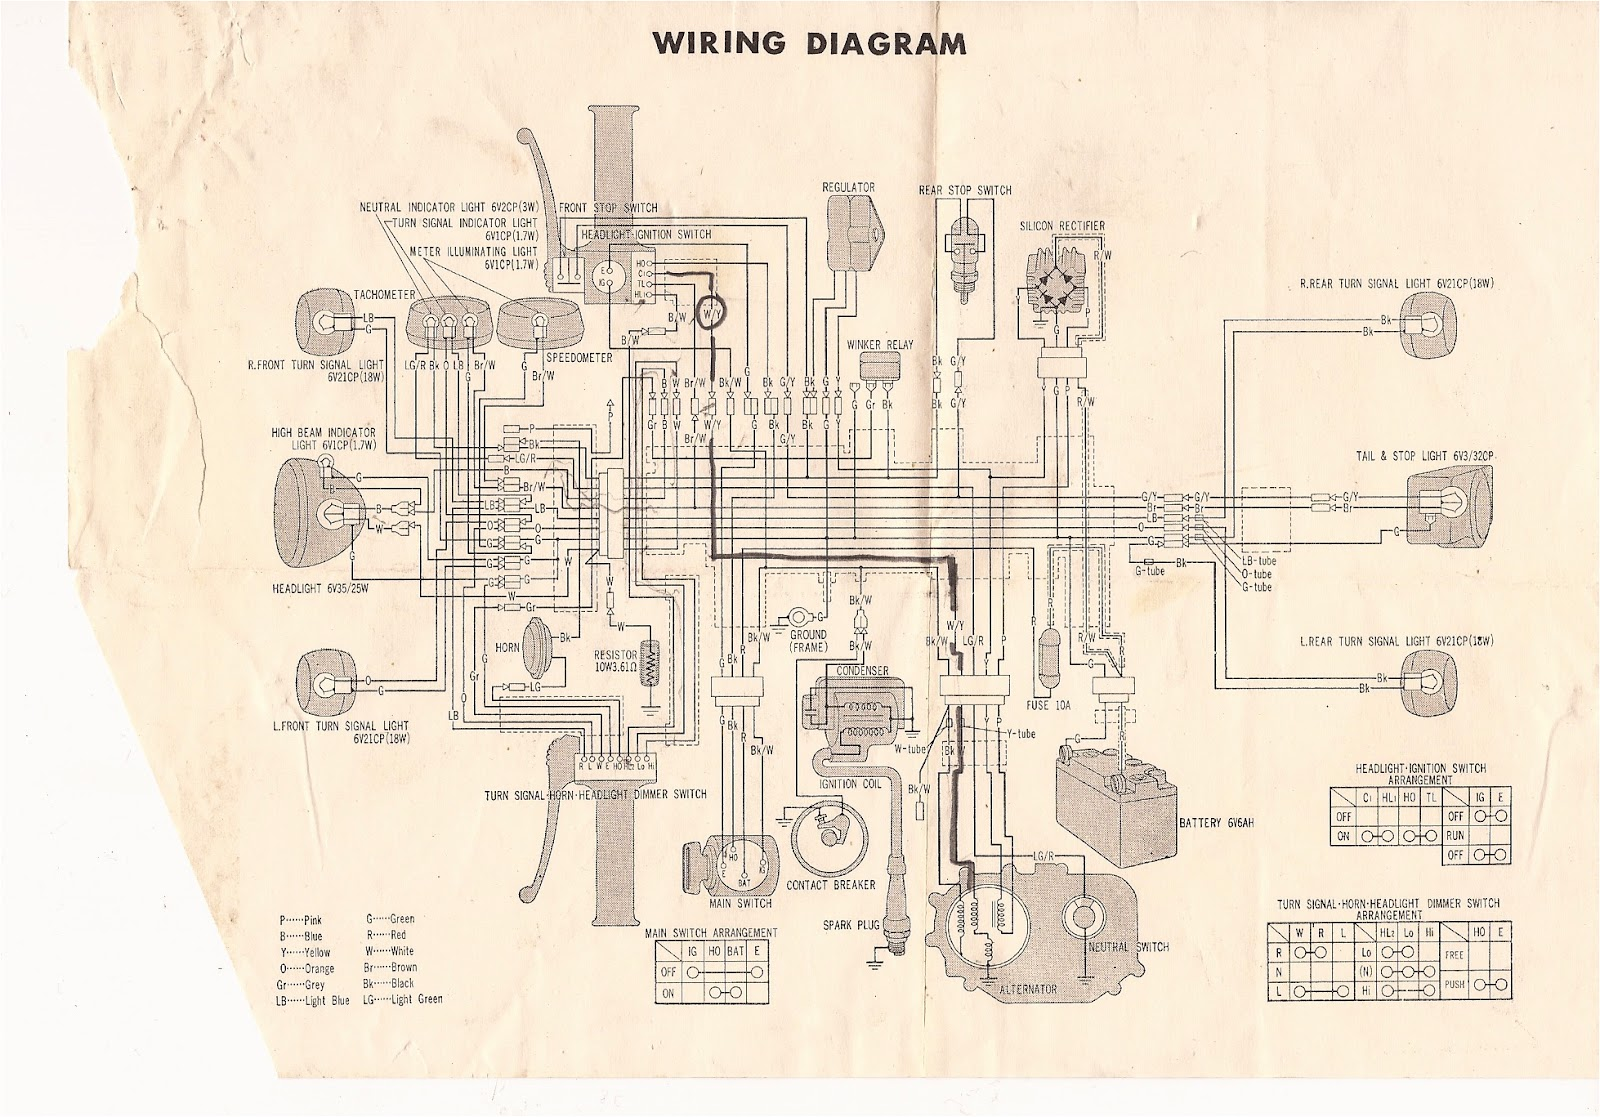 Charming Cb100 Wiring Diagram Images - Electrical Circuit Diagram ...